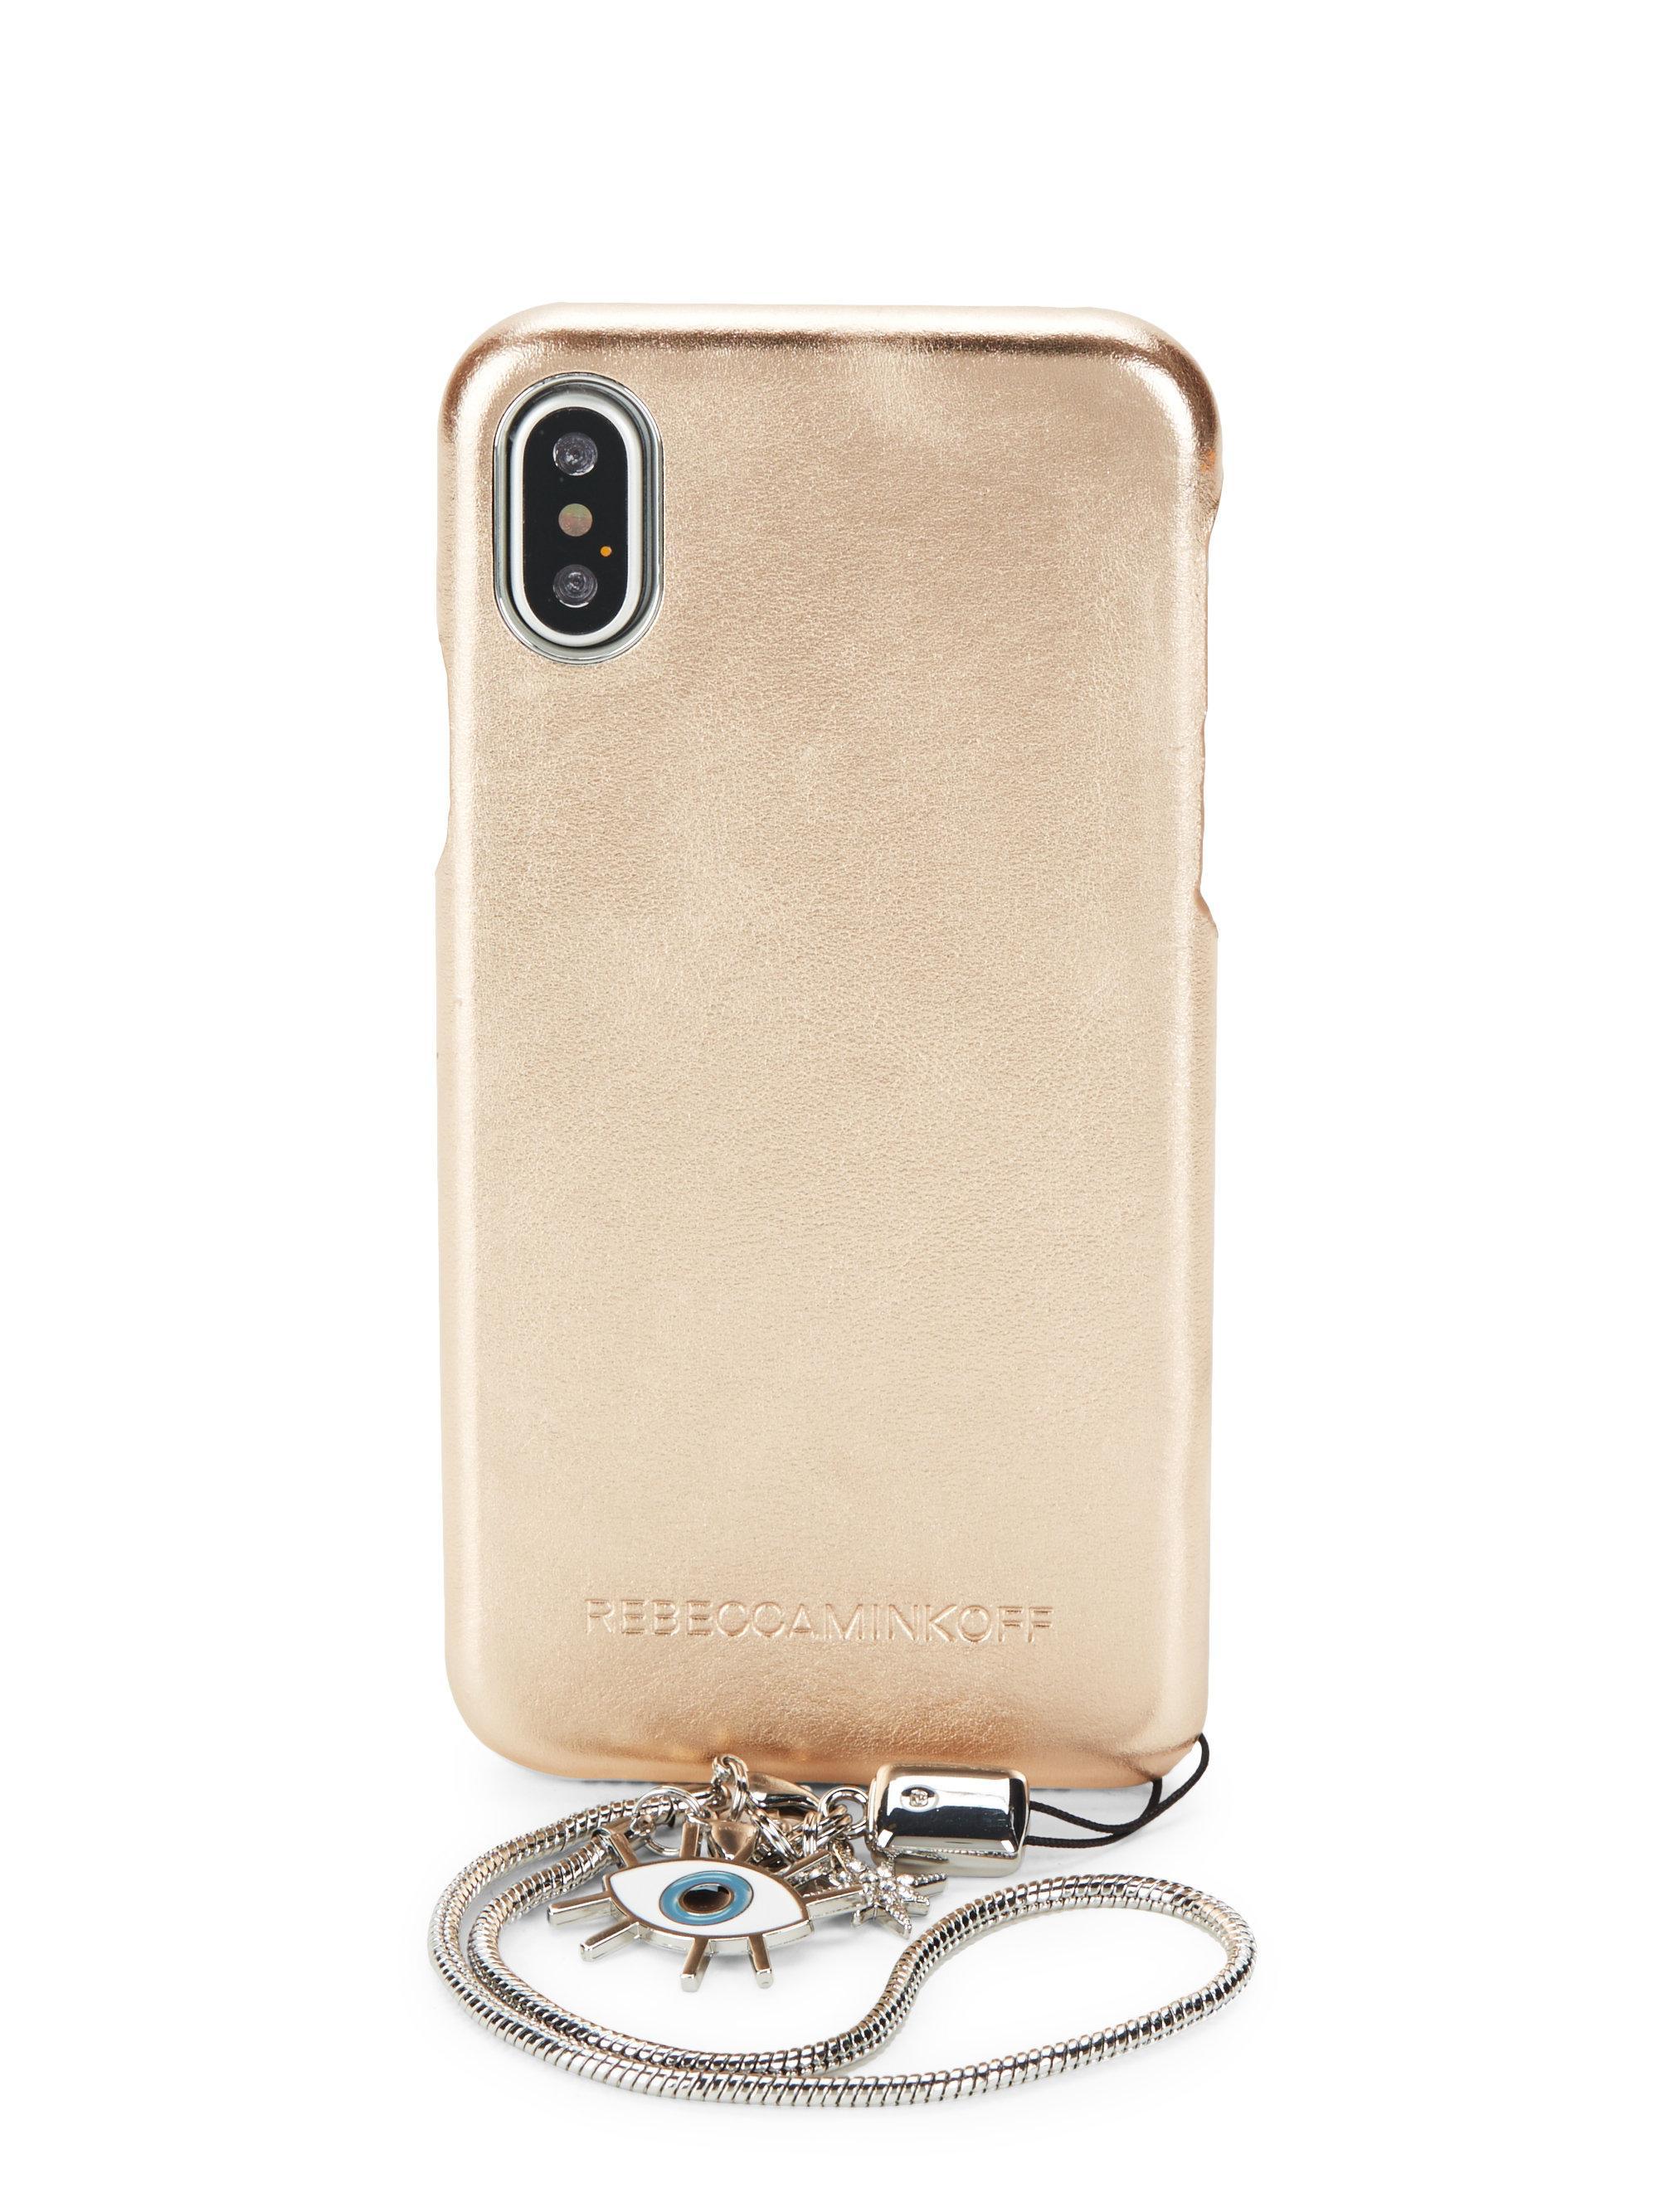 129409053 Rebecca Minkoff and Case-Mate have elevated tech accessories to the next  level.Case-Mate x Rebecca Minkoff Universal Fringe Crossbody - Almond.